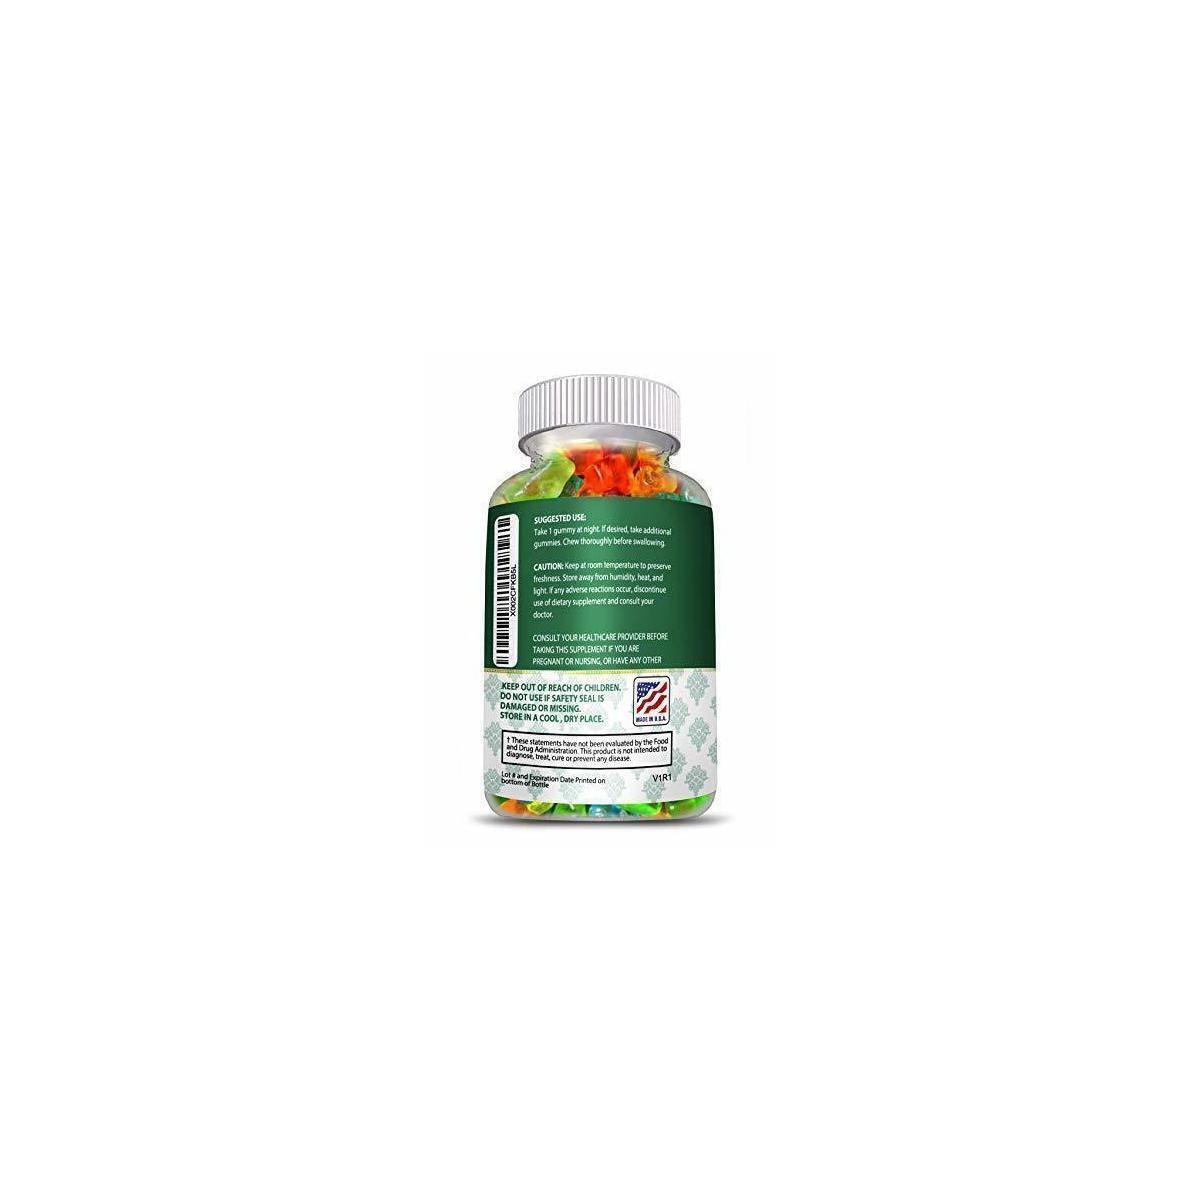 Hemp Melatonin Gummies-Sleep, Anxiety and Stress Relief 5mg Melatonin+25mg Hemp 750mg of 100% Pure Organic Hemp Extract in Every Gummy. #1 Natural Sleep Aid to Promote restful Sleep -30 Servings